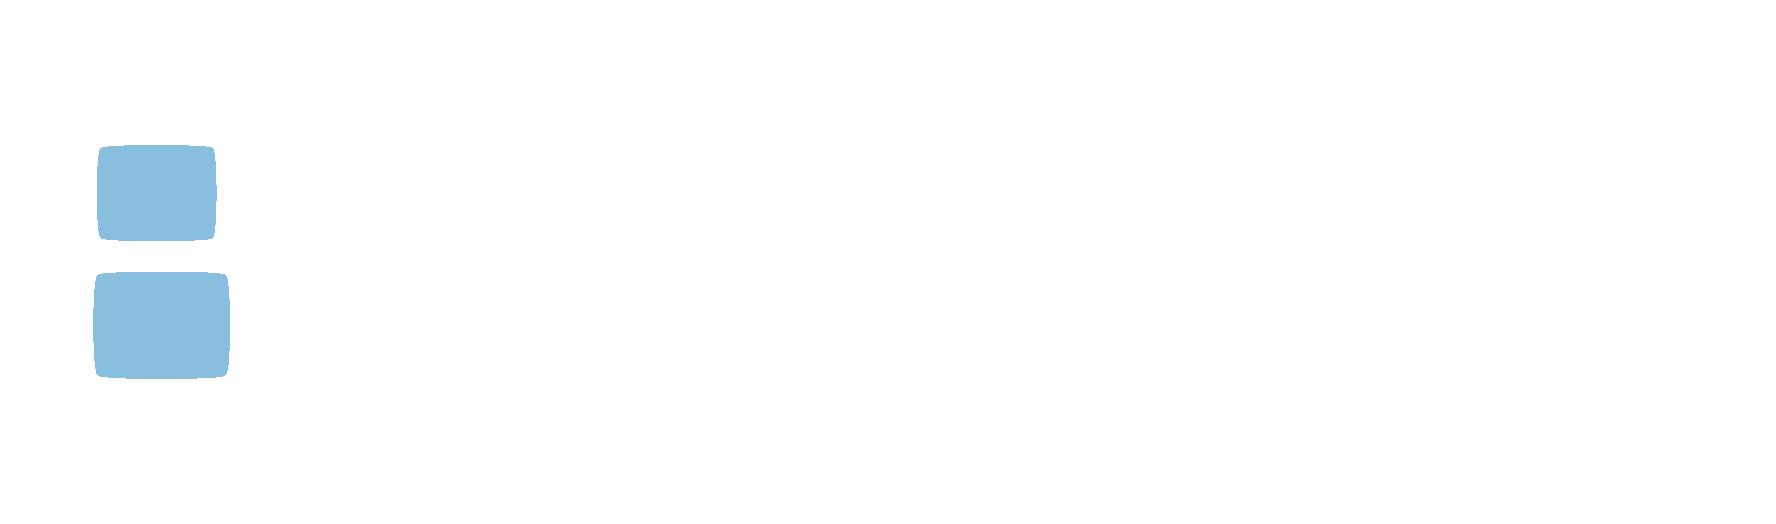 Tagline - Sky White - RGB - BH Logo - Branding